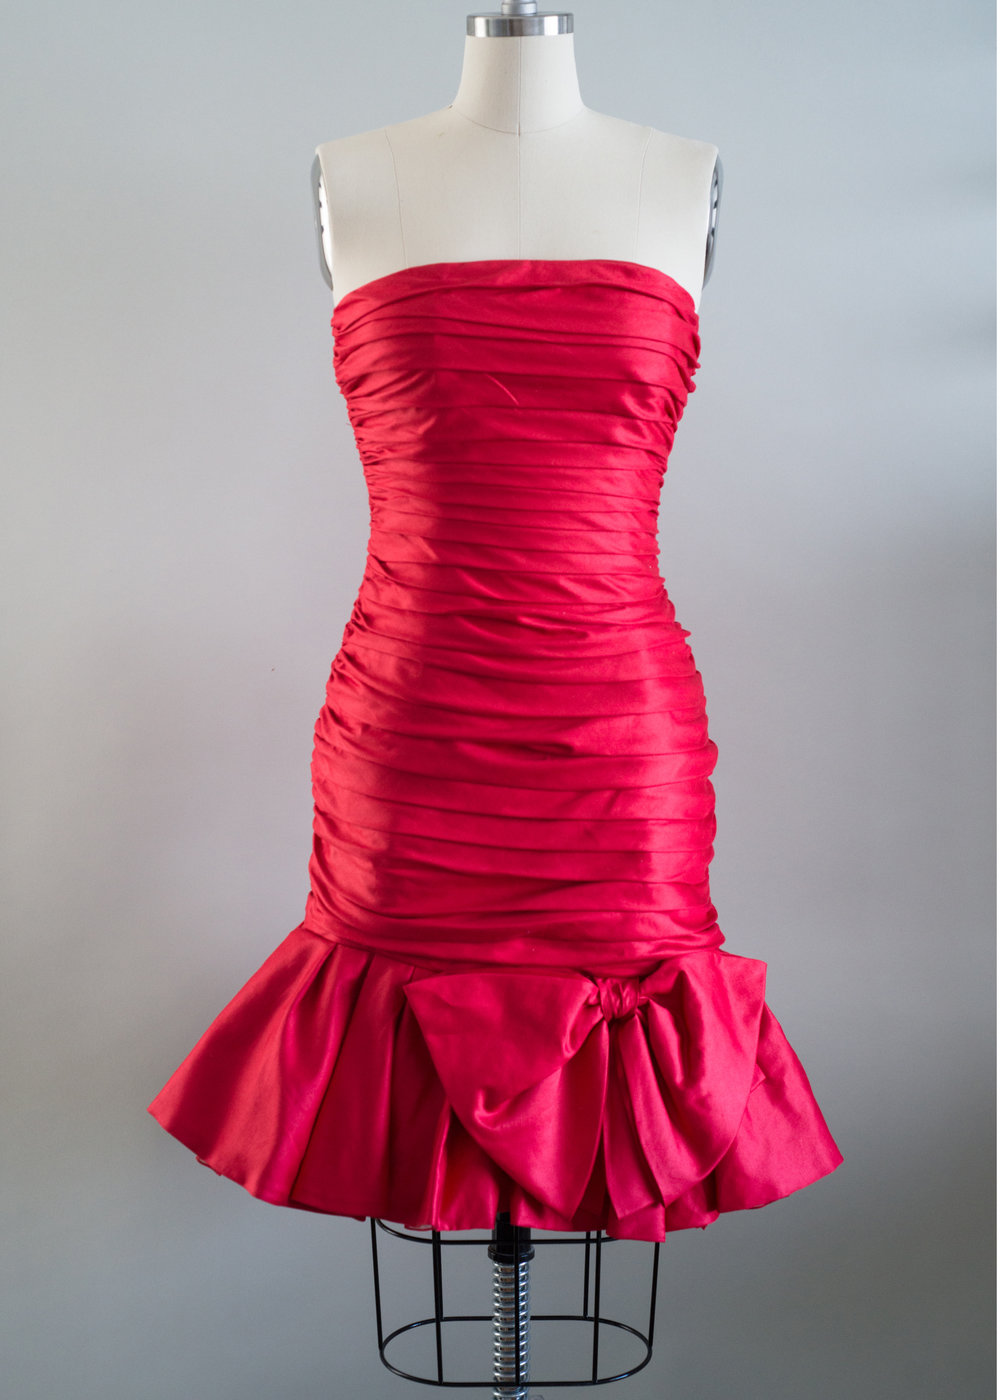 Dior pink dress cocktail